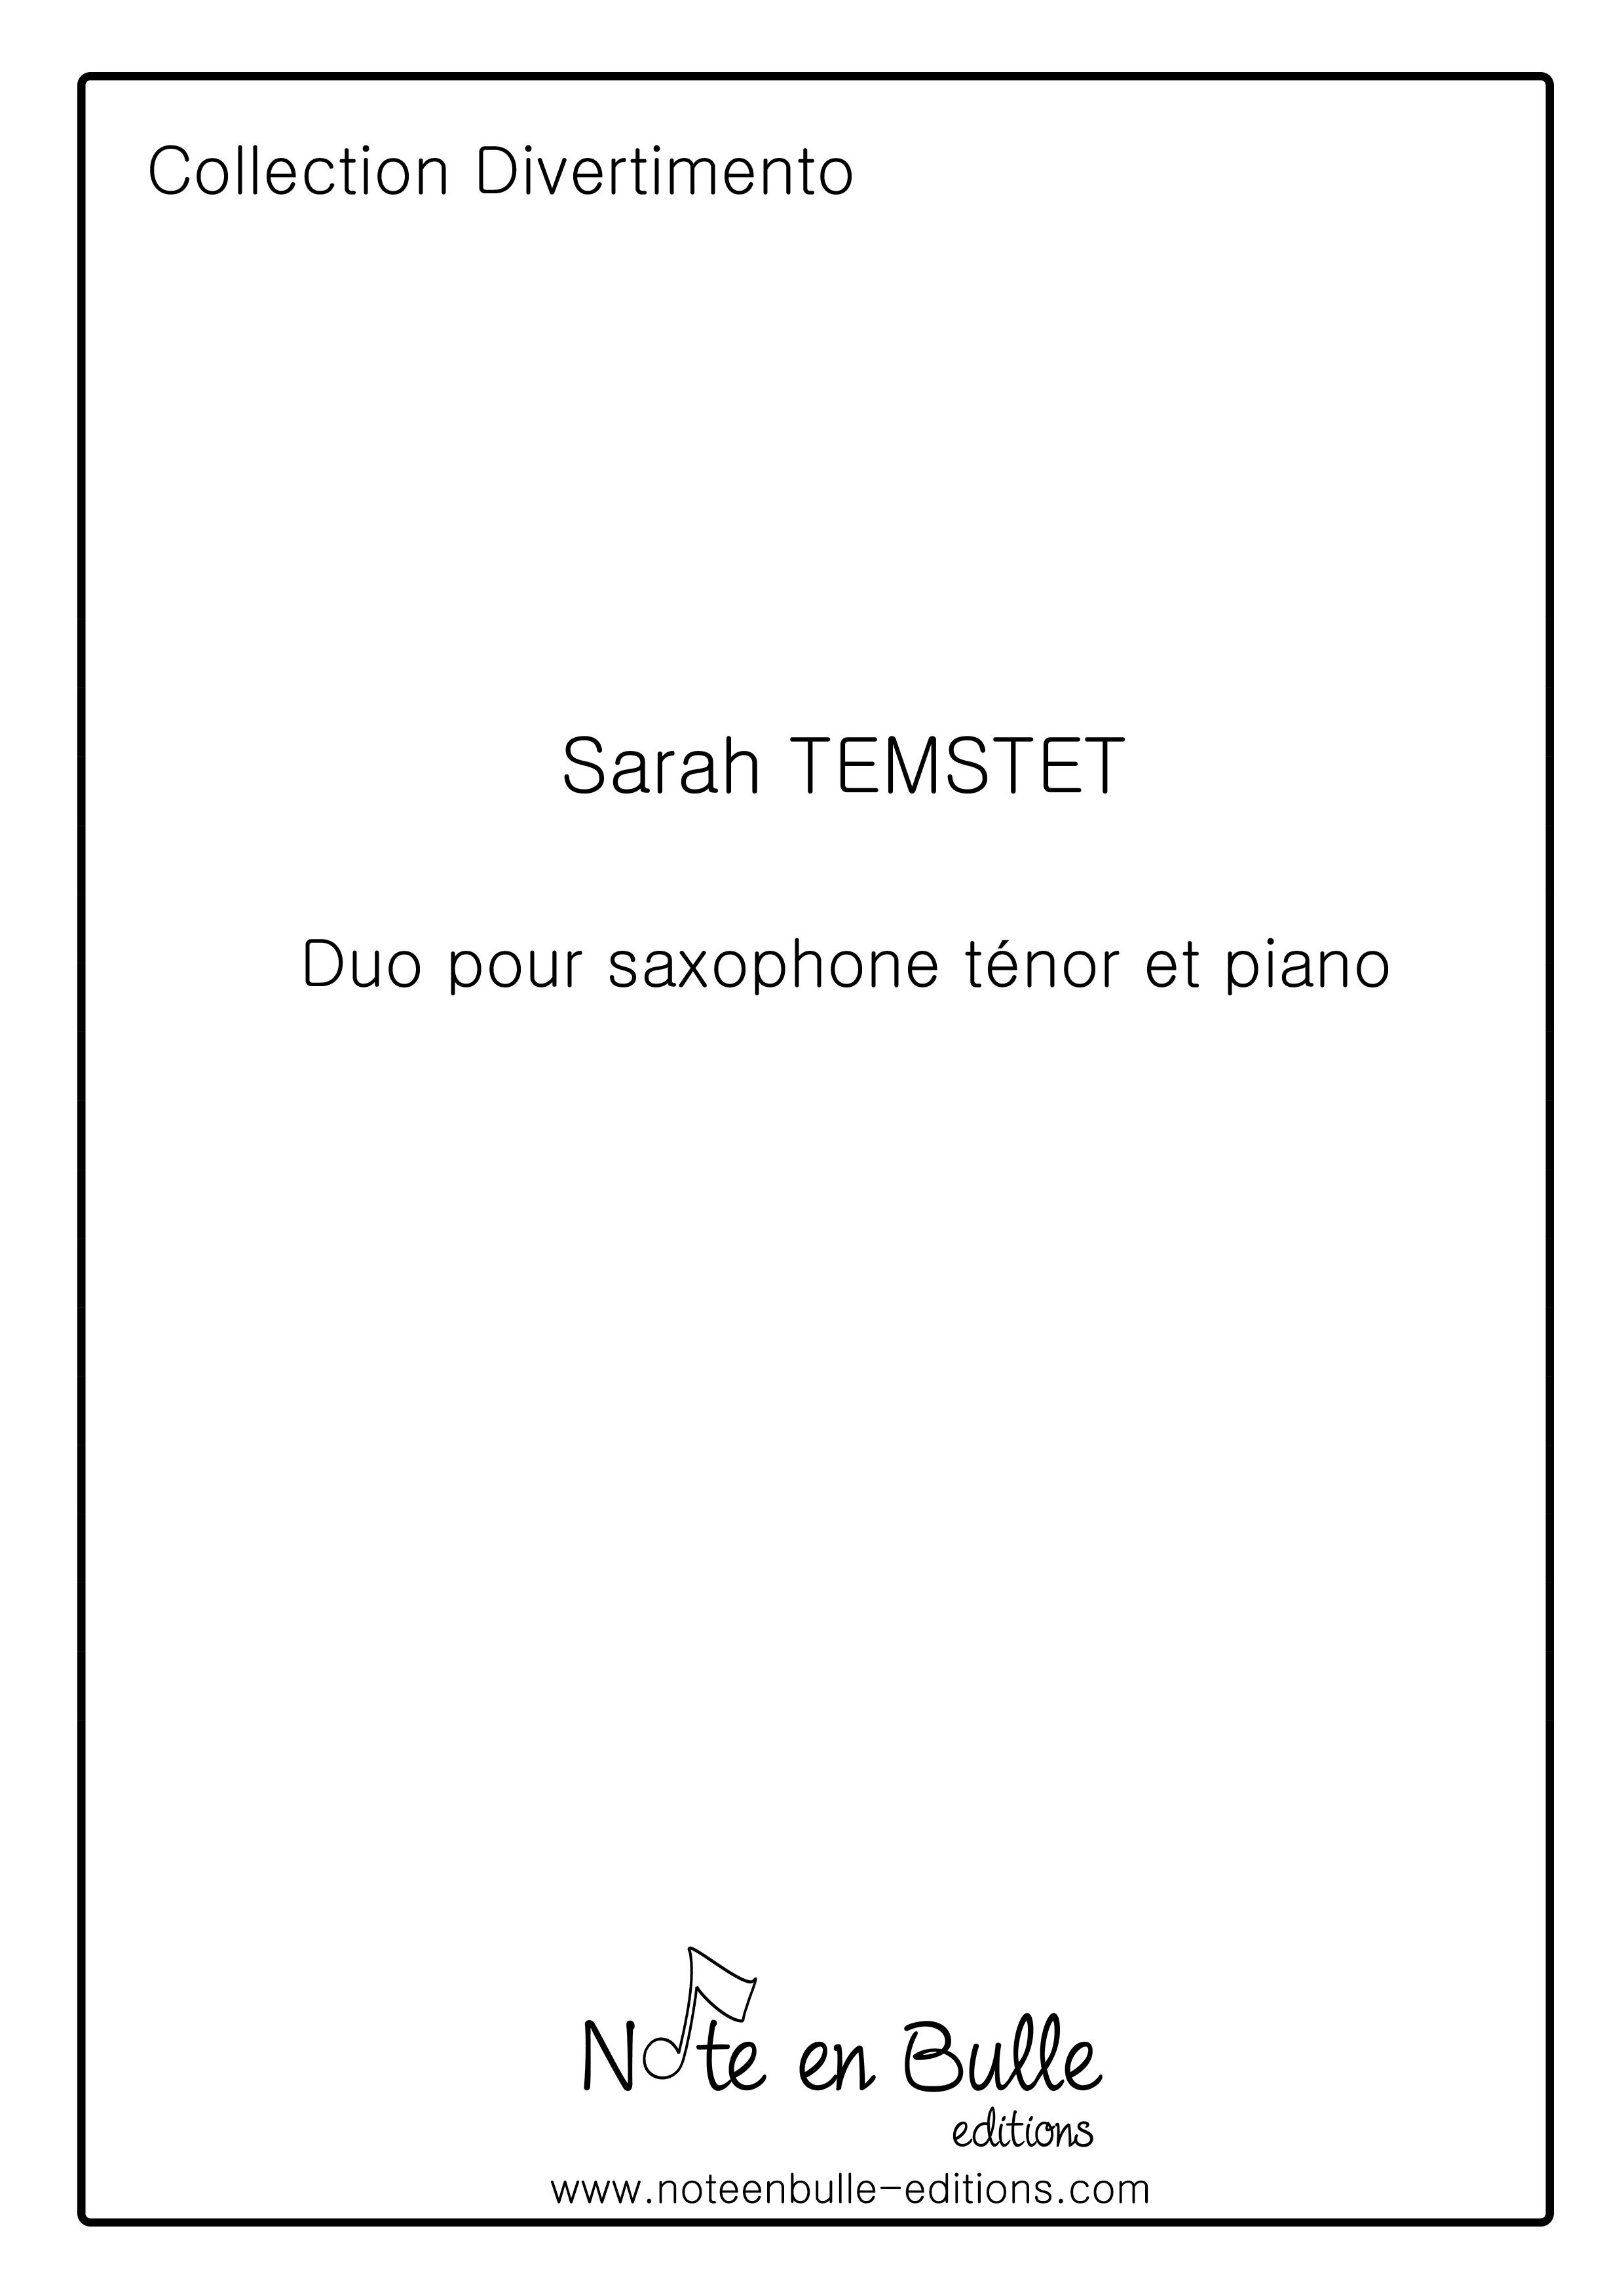 duo_ST_Pn_Sarah-Temstet-couverture.jpg